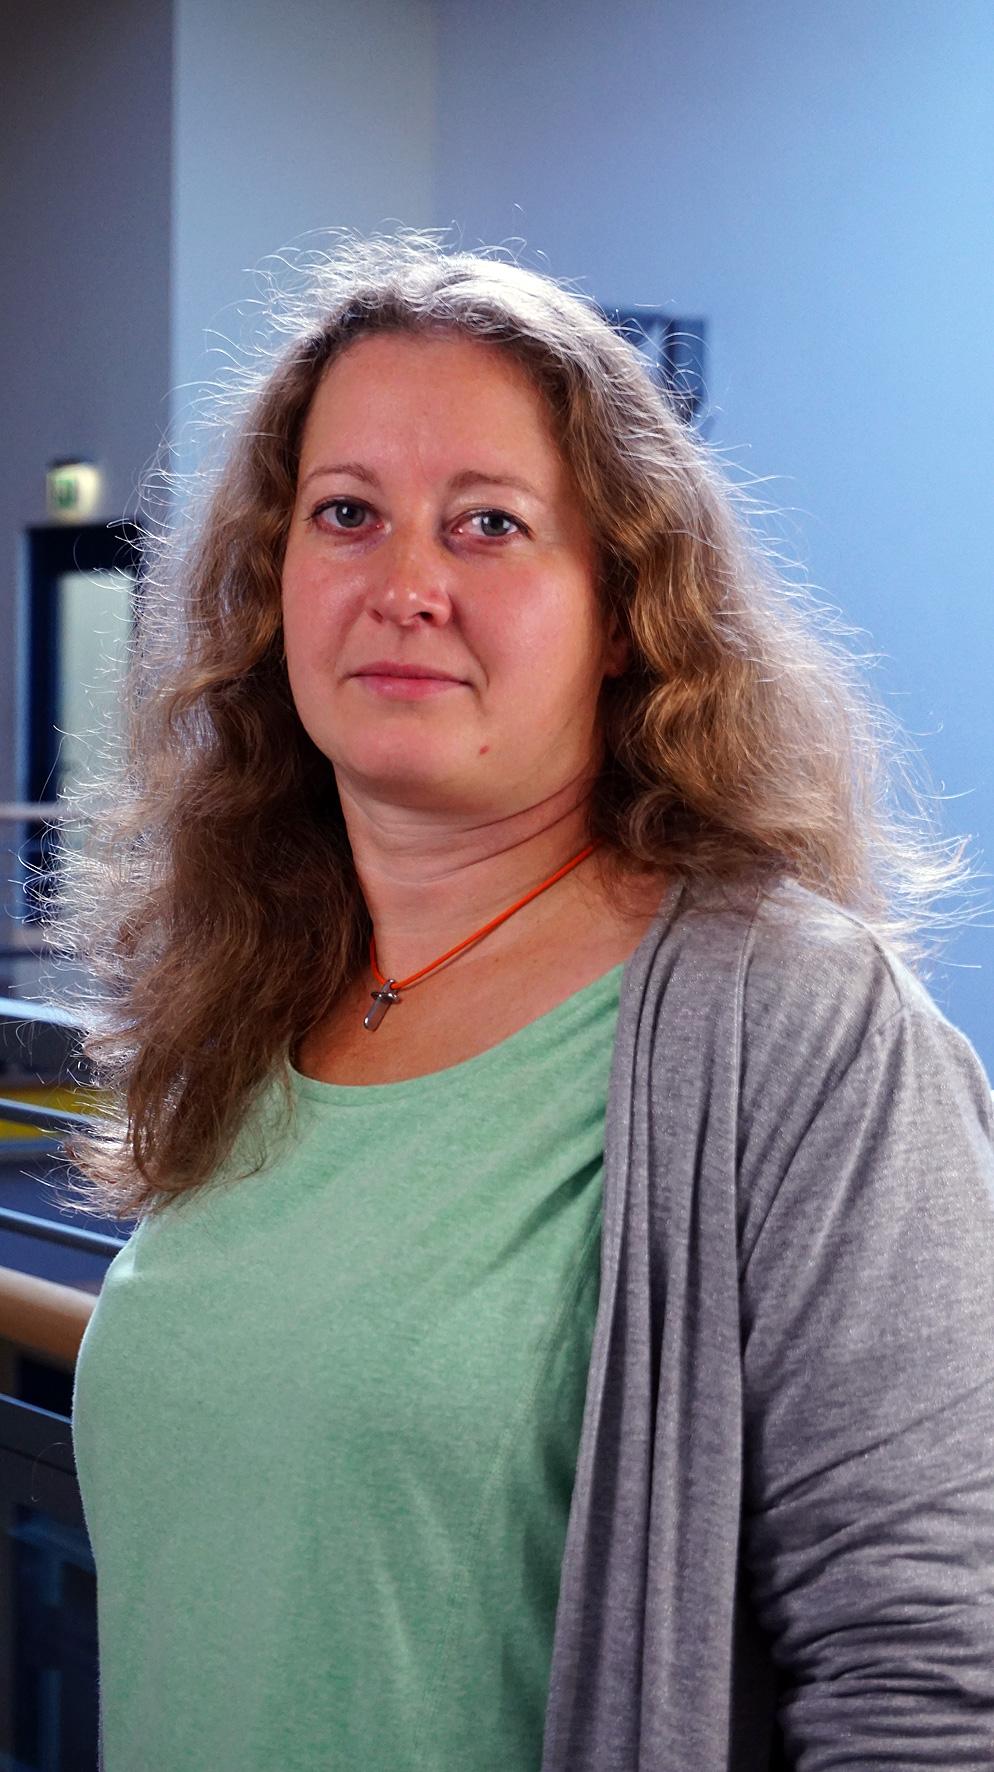 Lydia Tuschmann